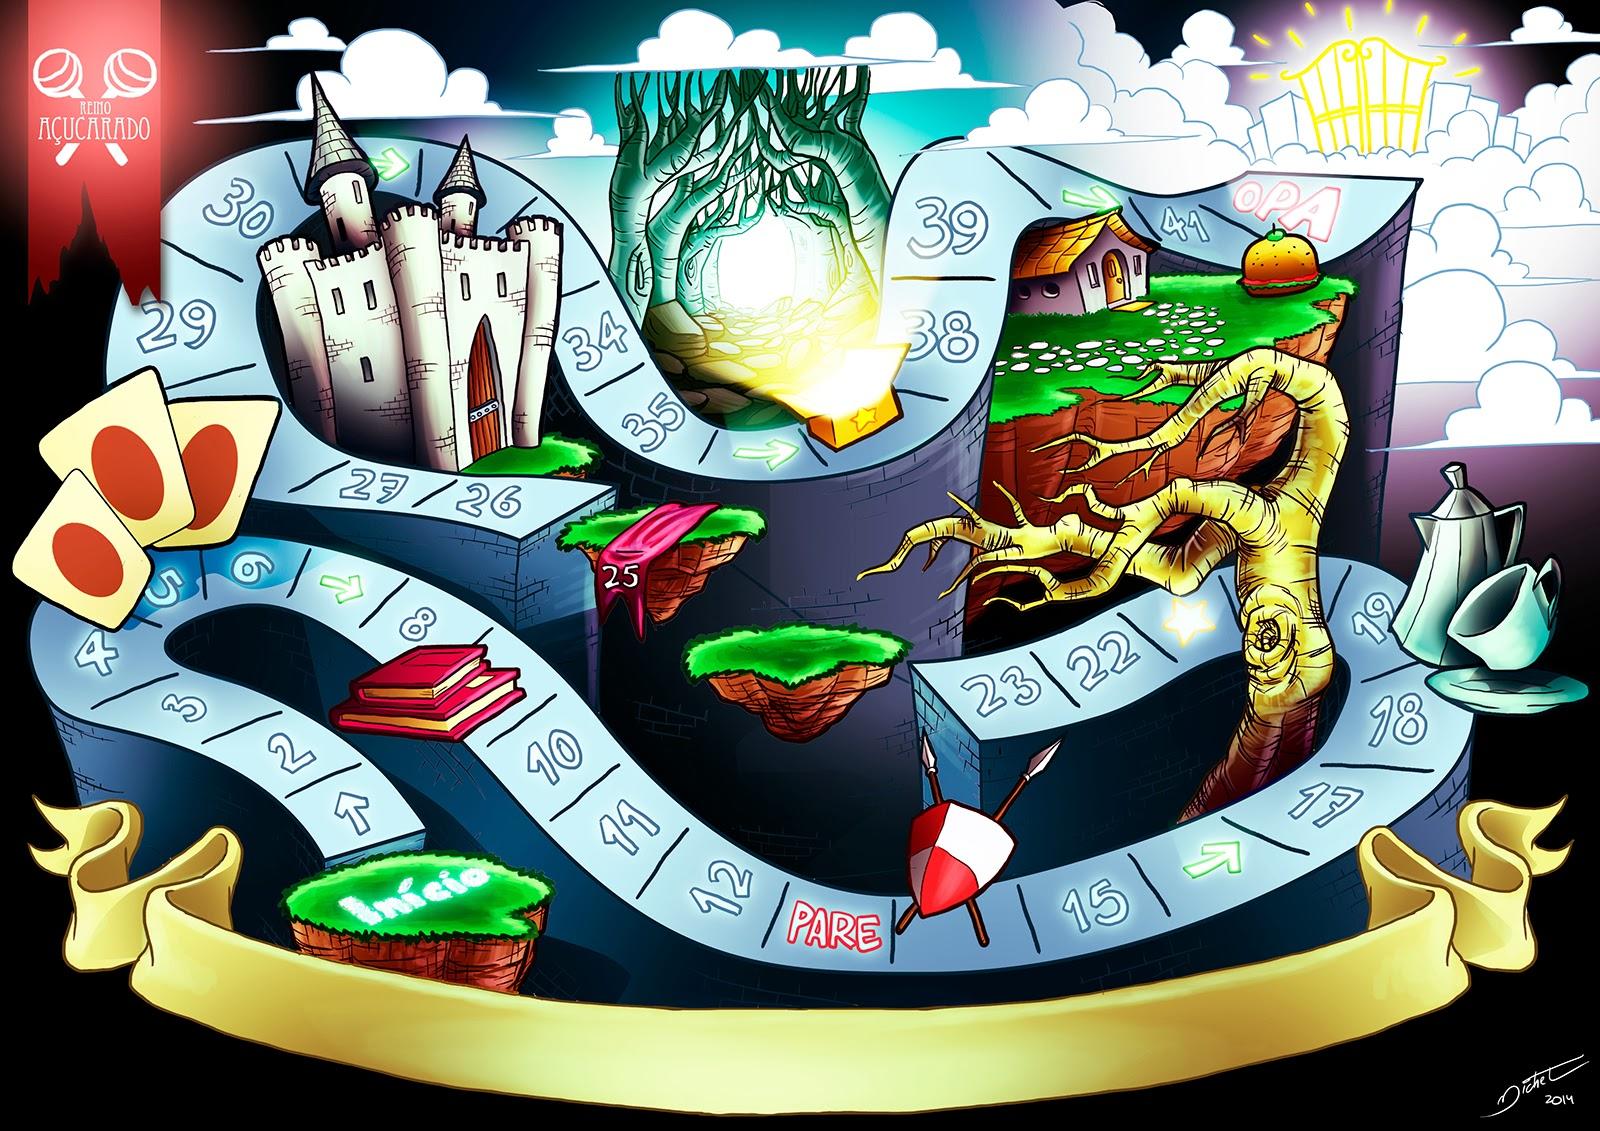 Tabuleiro de jogo - Michel Ramalho